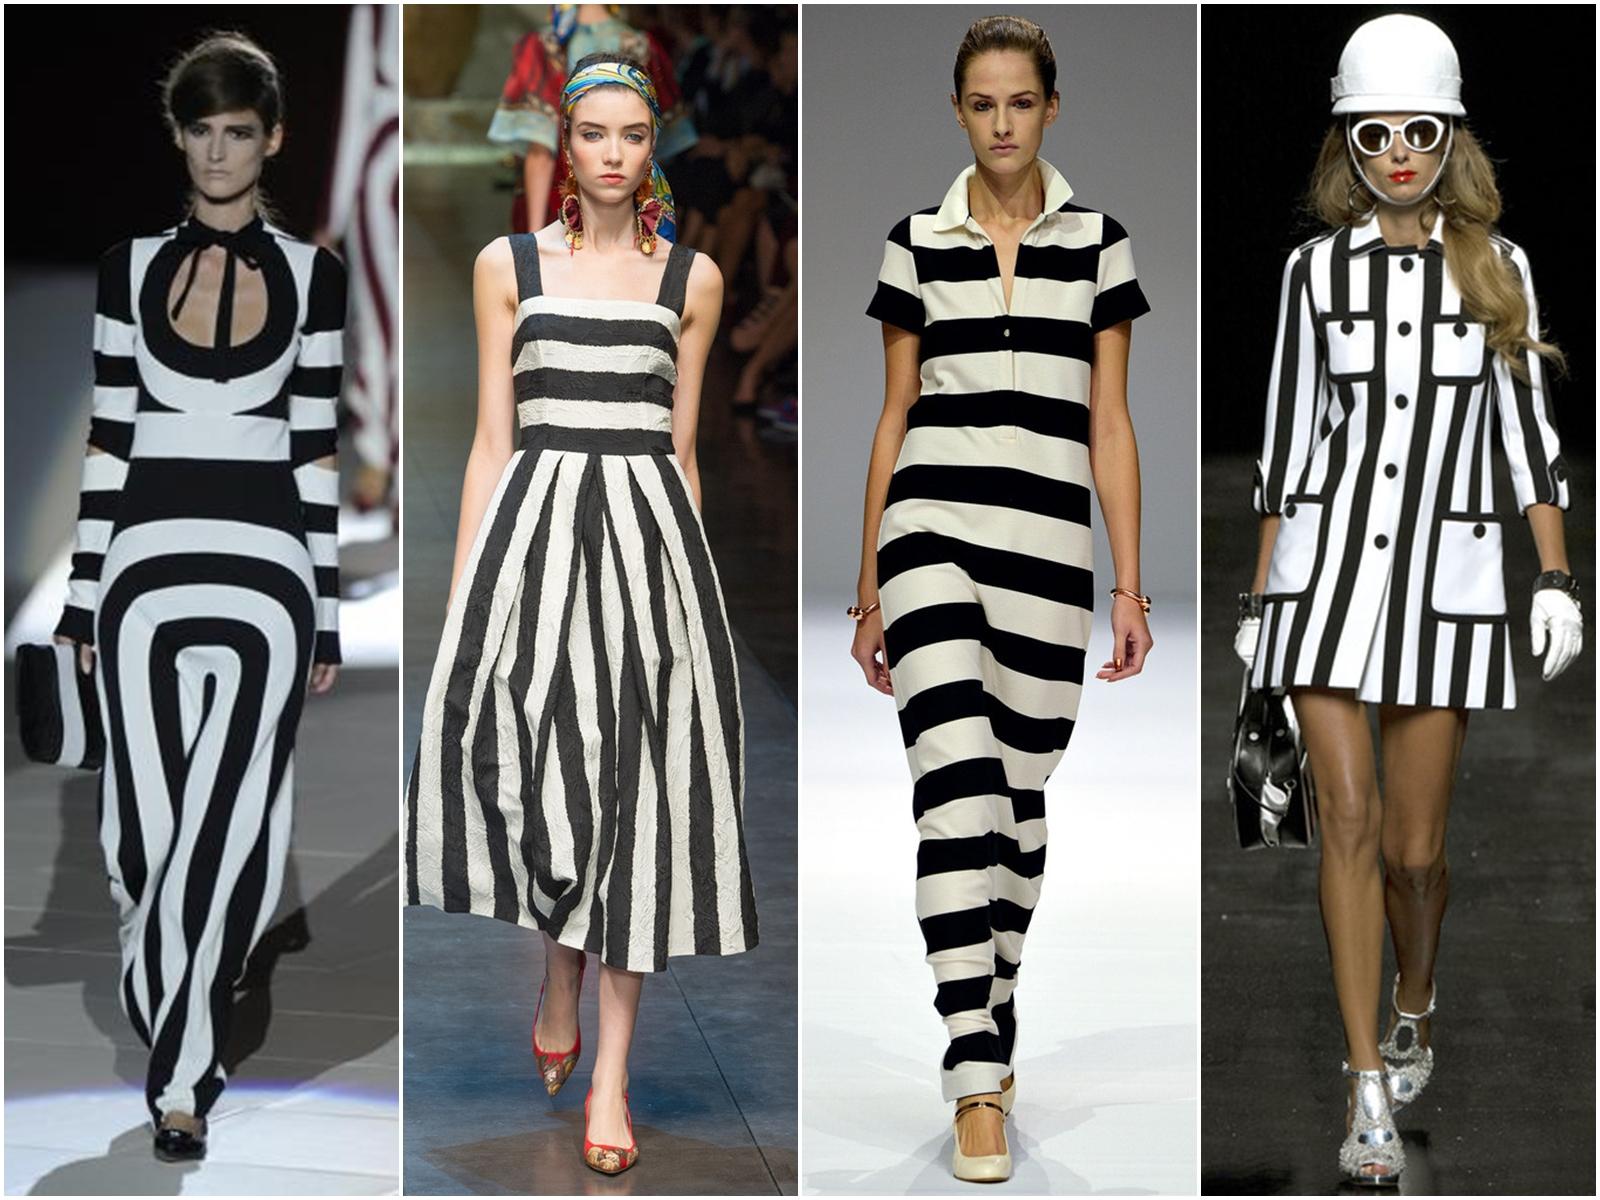 tendencia-moda-primavera-verao-2015-listras